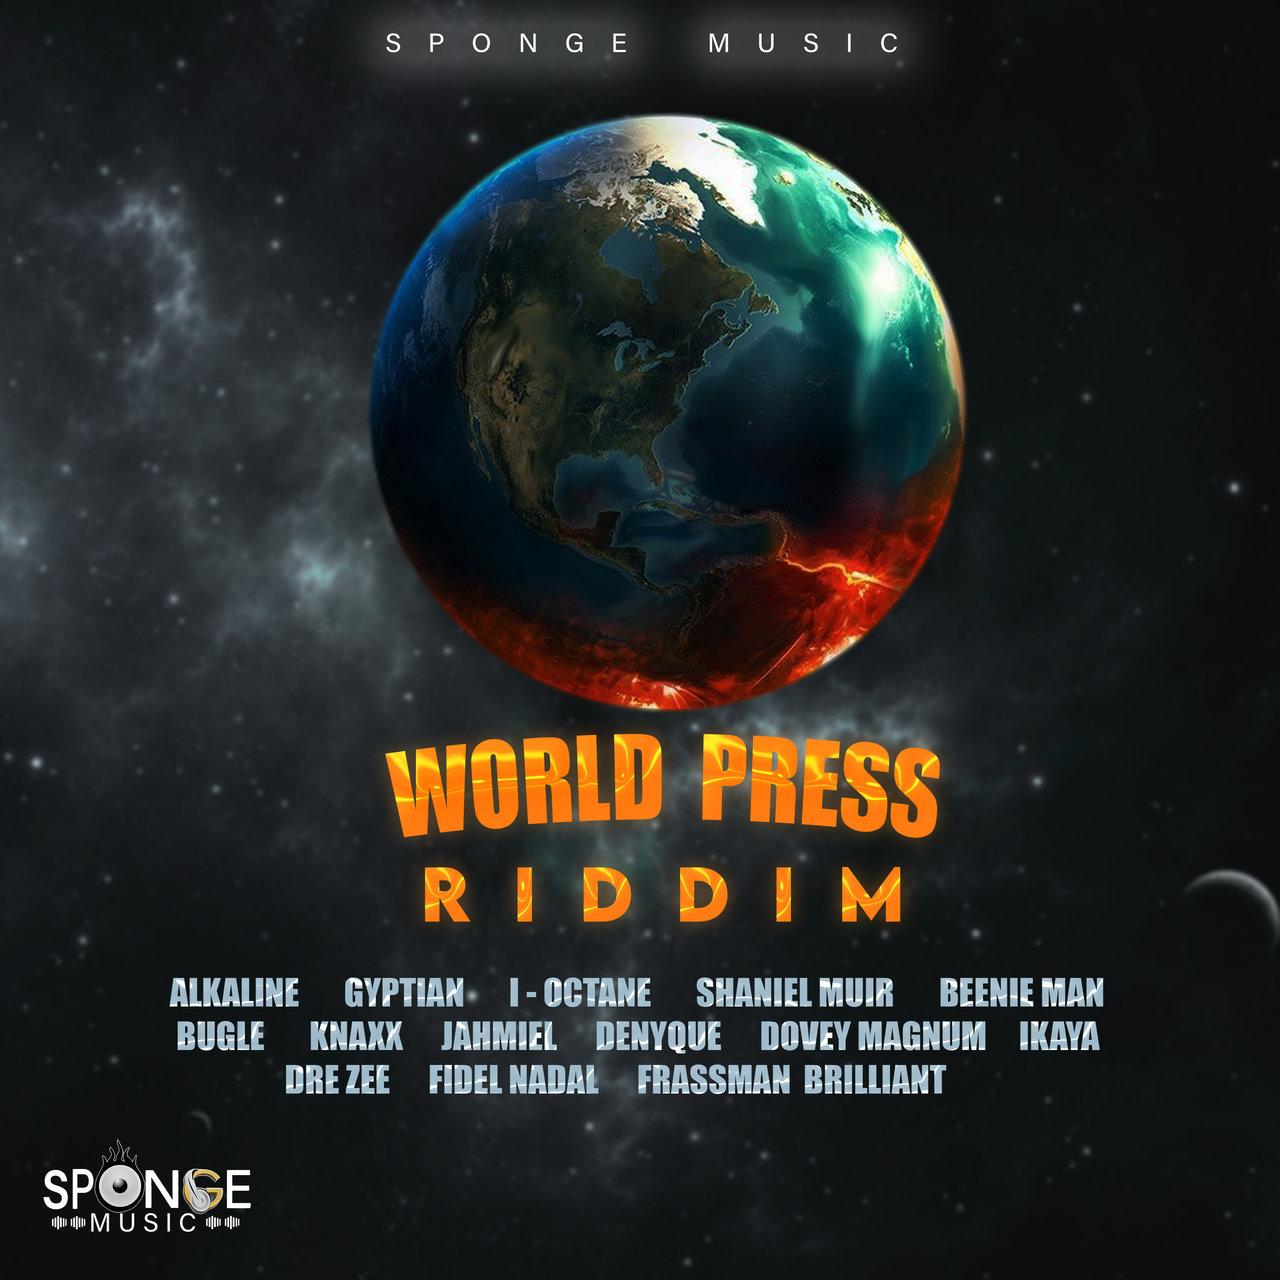 World Press Riddim (Cover)